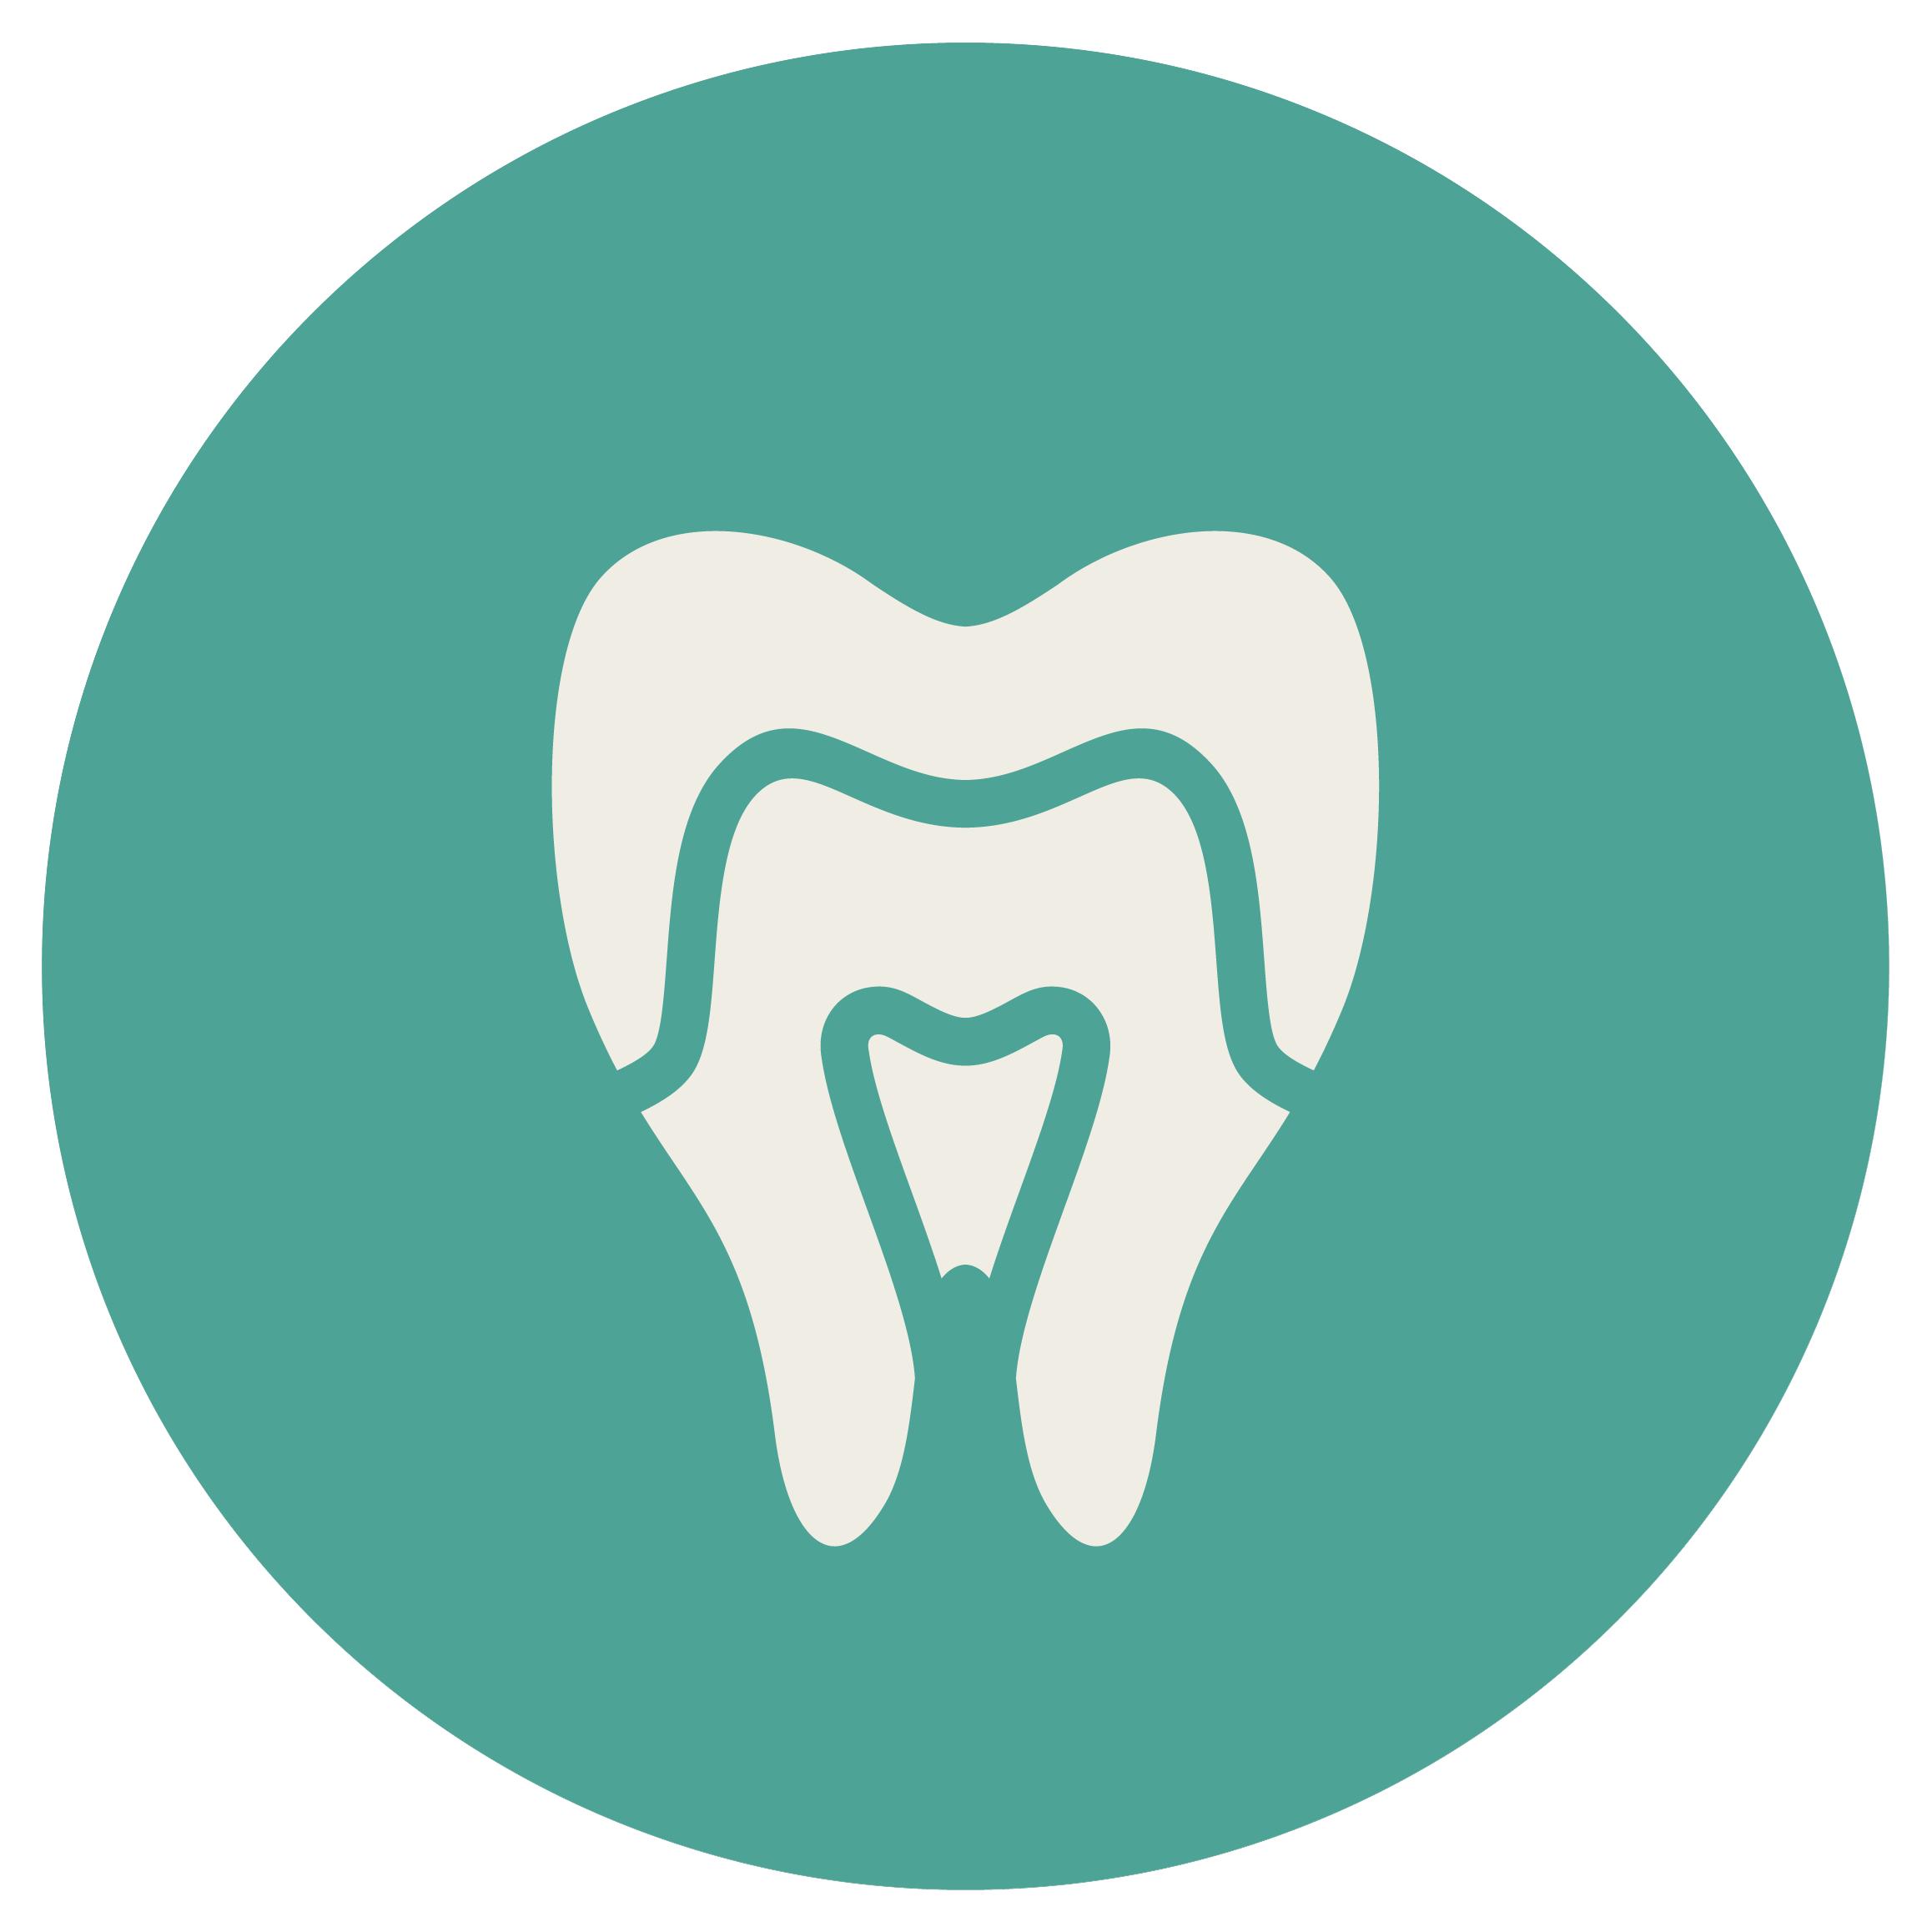 crowns-dentistry-crestwood-dental-clarkston-michigan-dentist-friendly-h